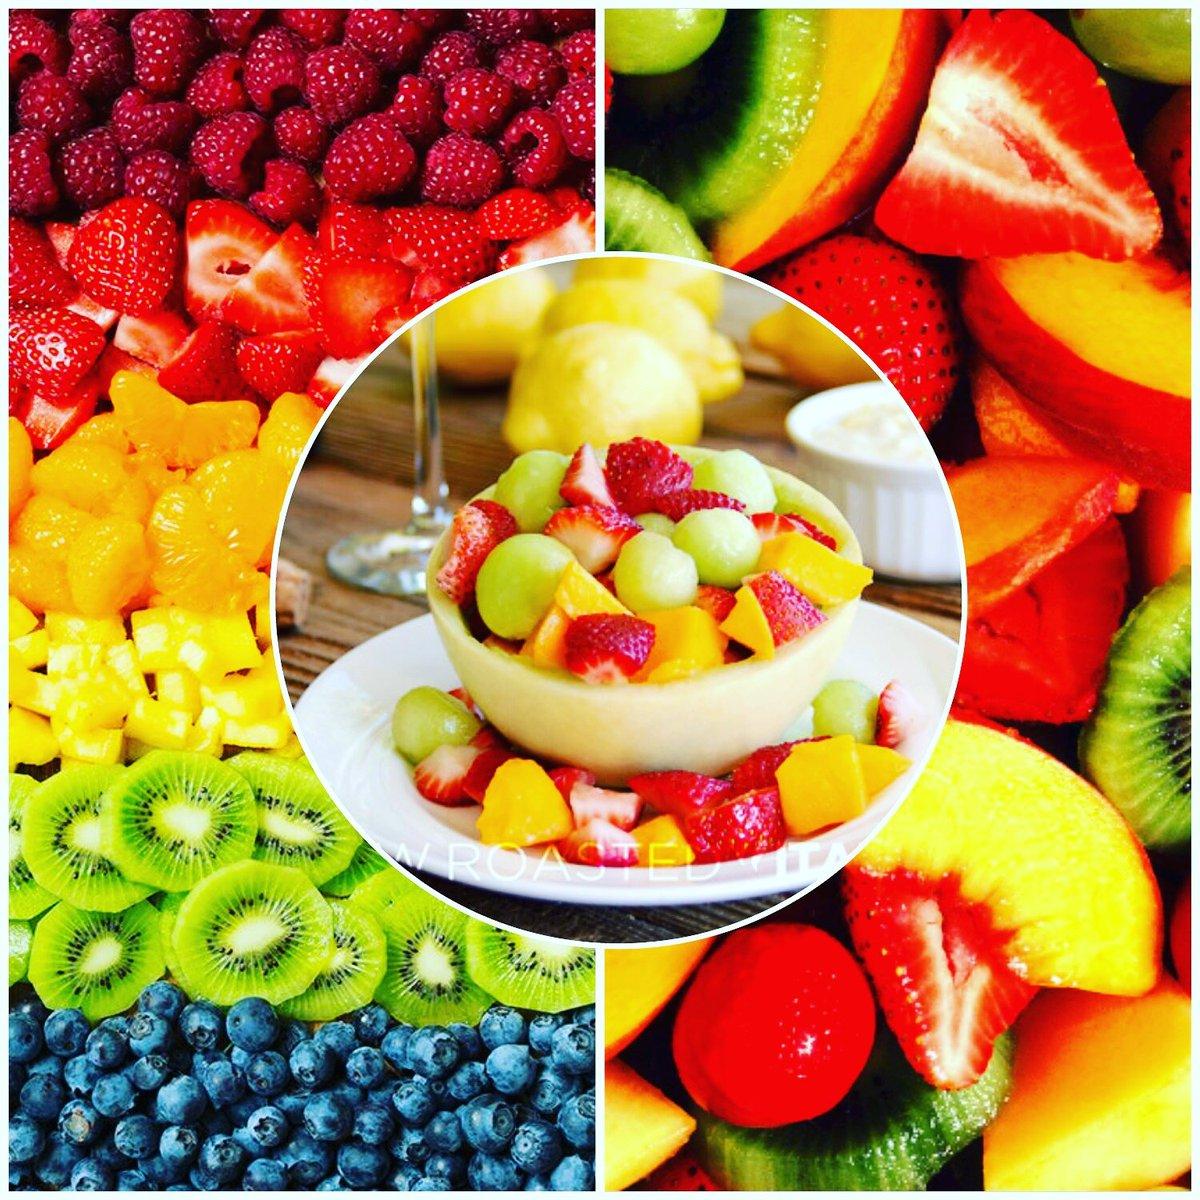 Fruit Bowls fastfood (@Fruit_Bowls1)   Twitter